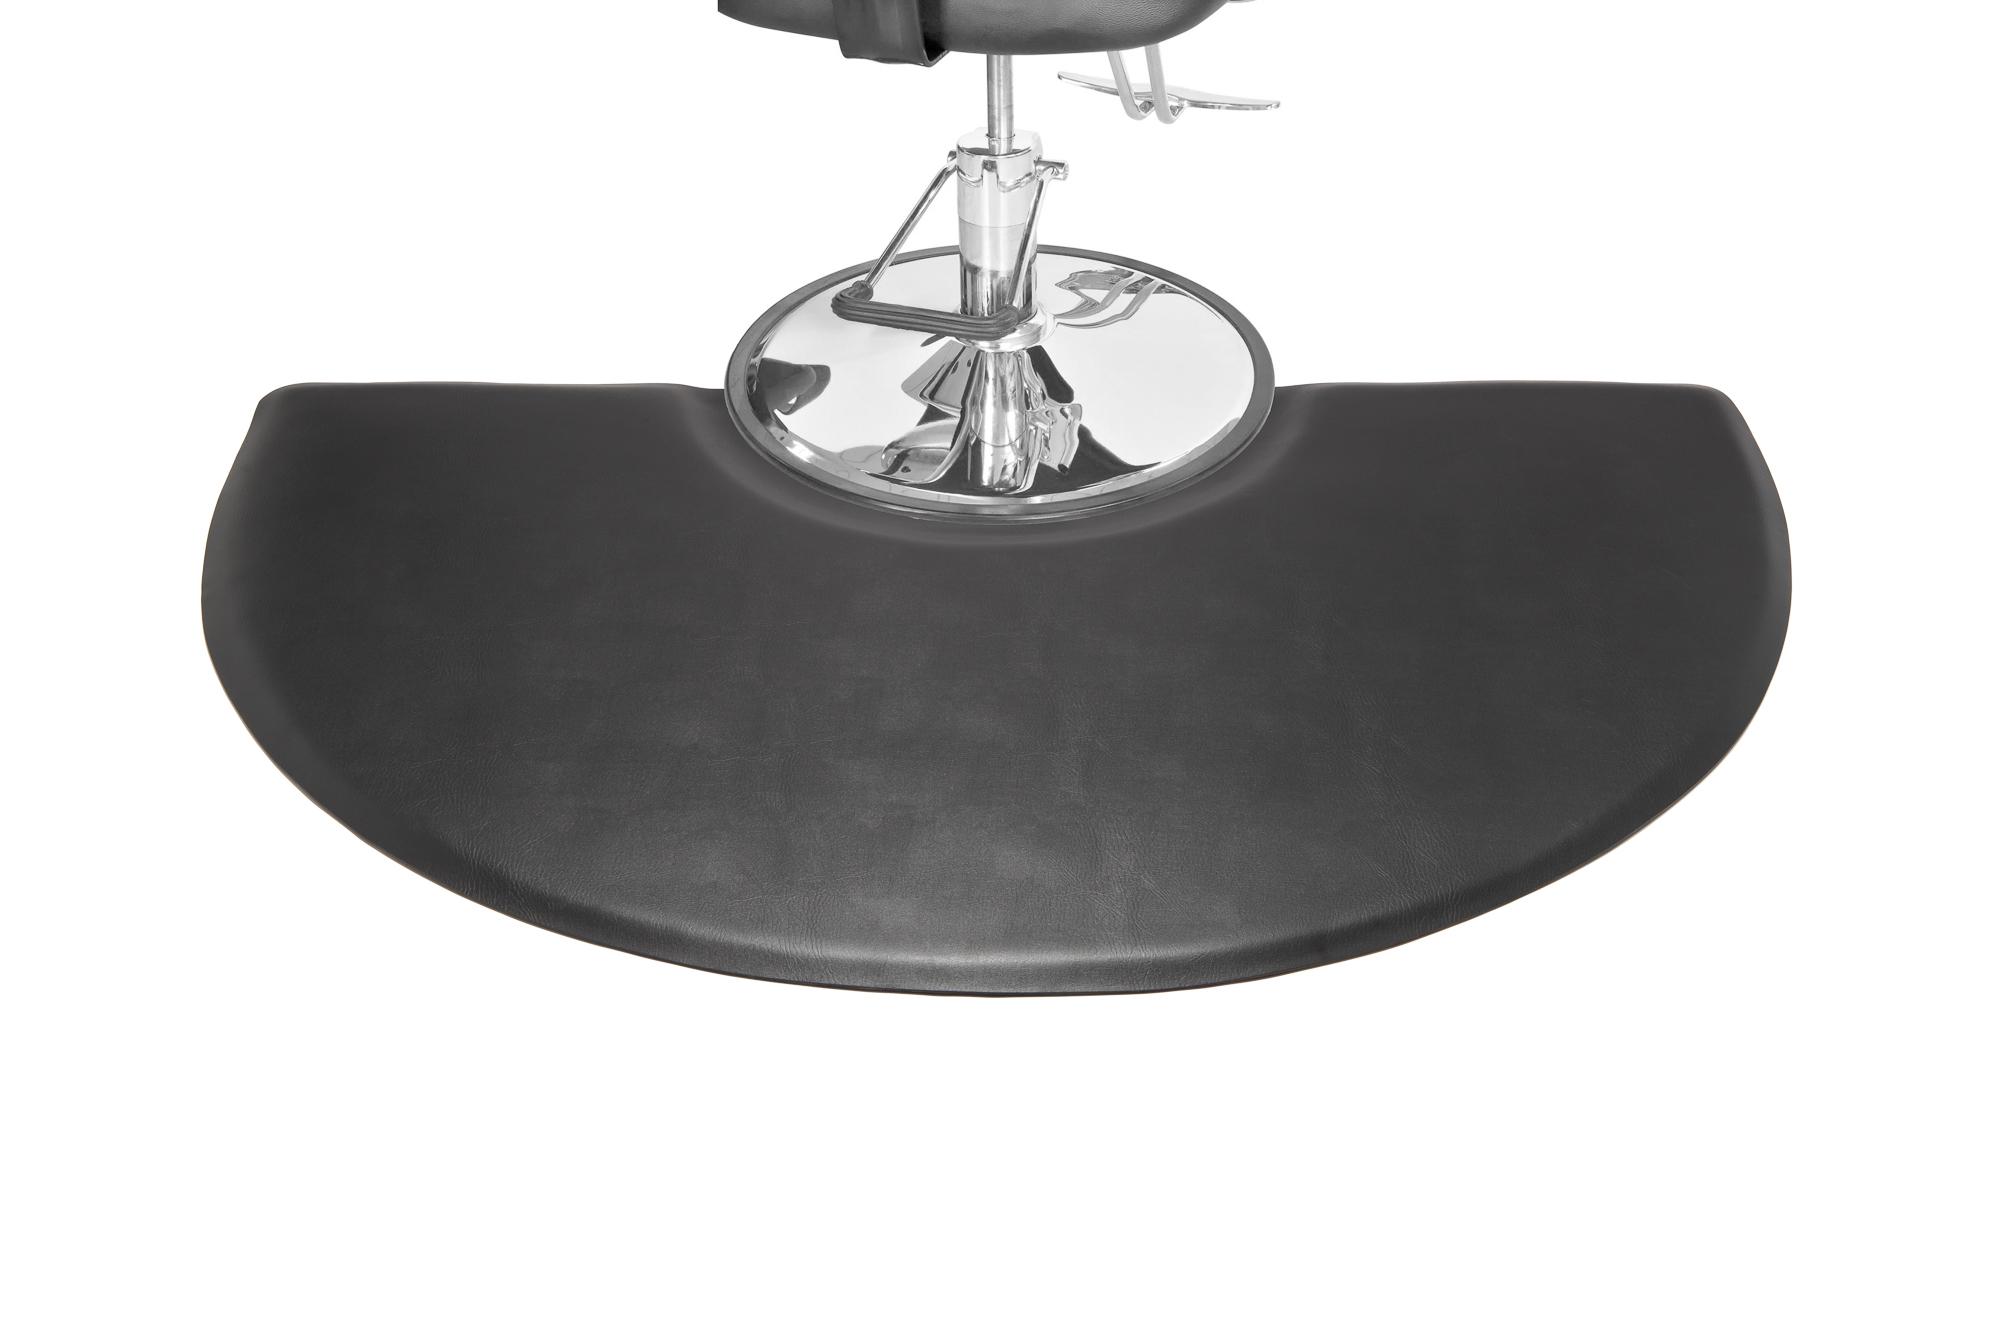 Work-step frisör Halvcirkel stor model